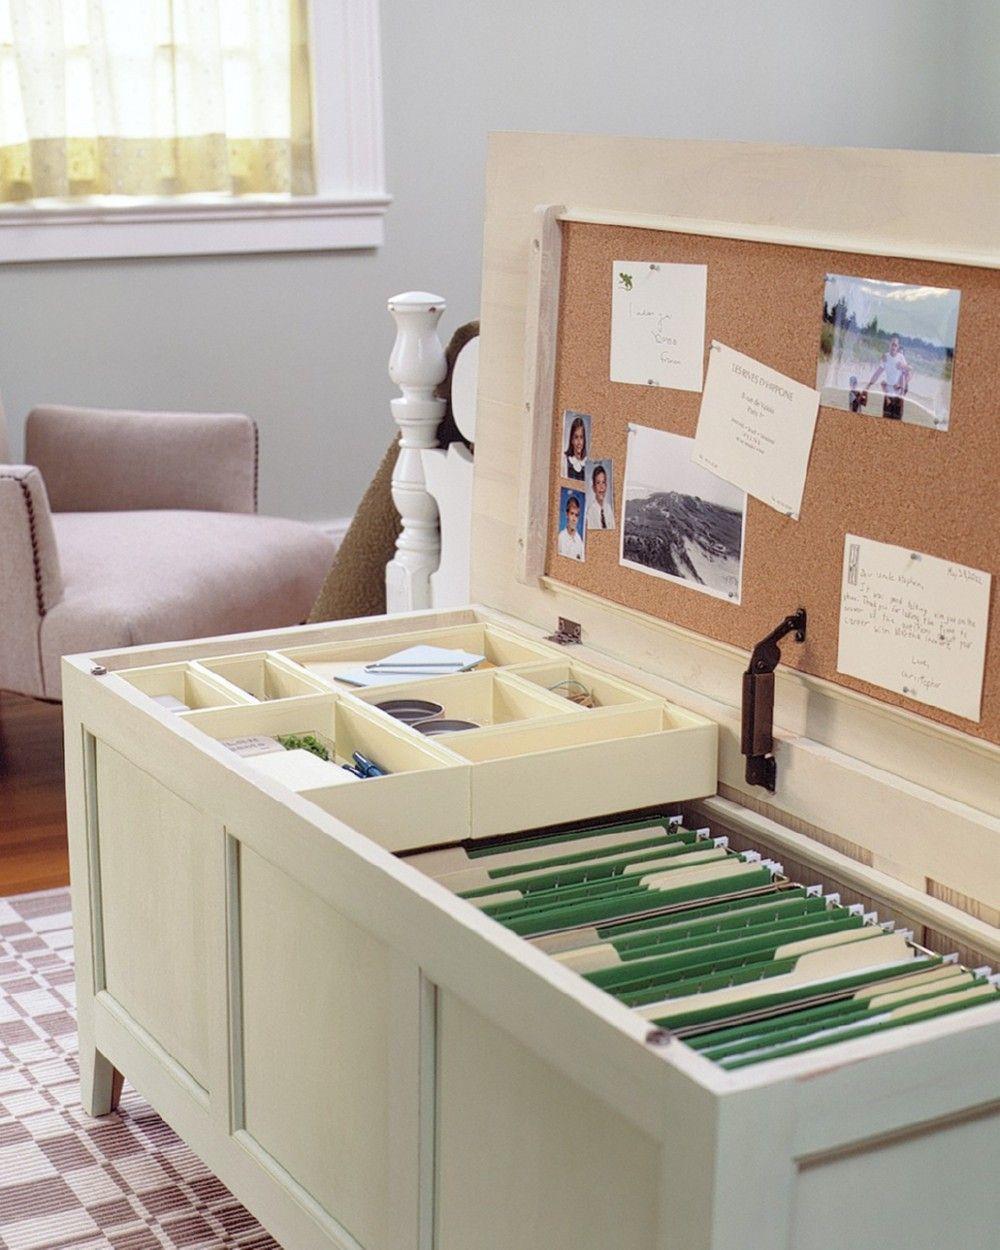 Beau Craftsman Farmhouse, Storage Organization, Bench, Cabinet, Ideas,  Furniture, Home Decor